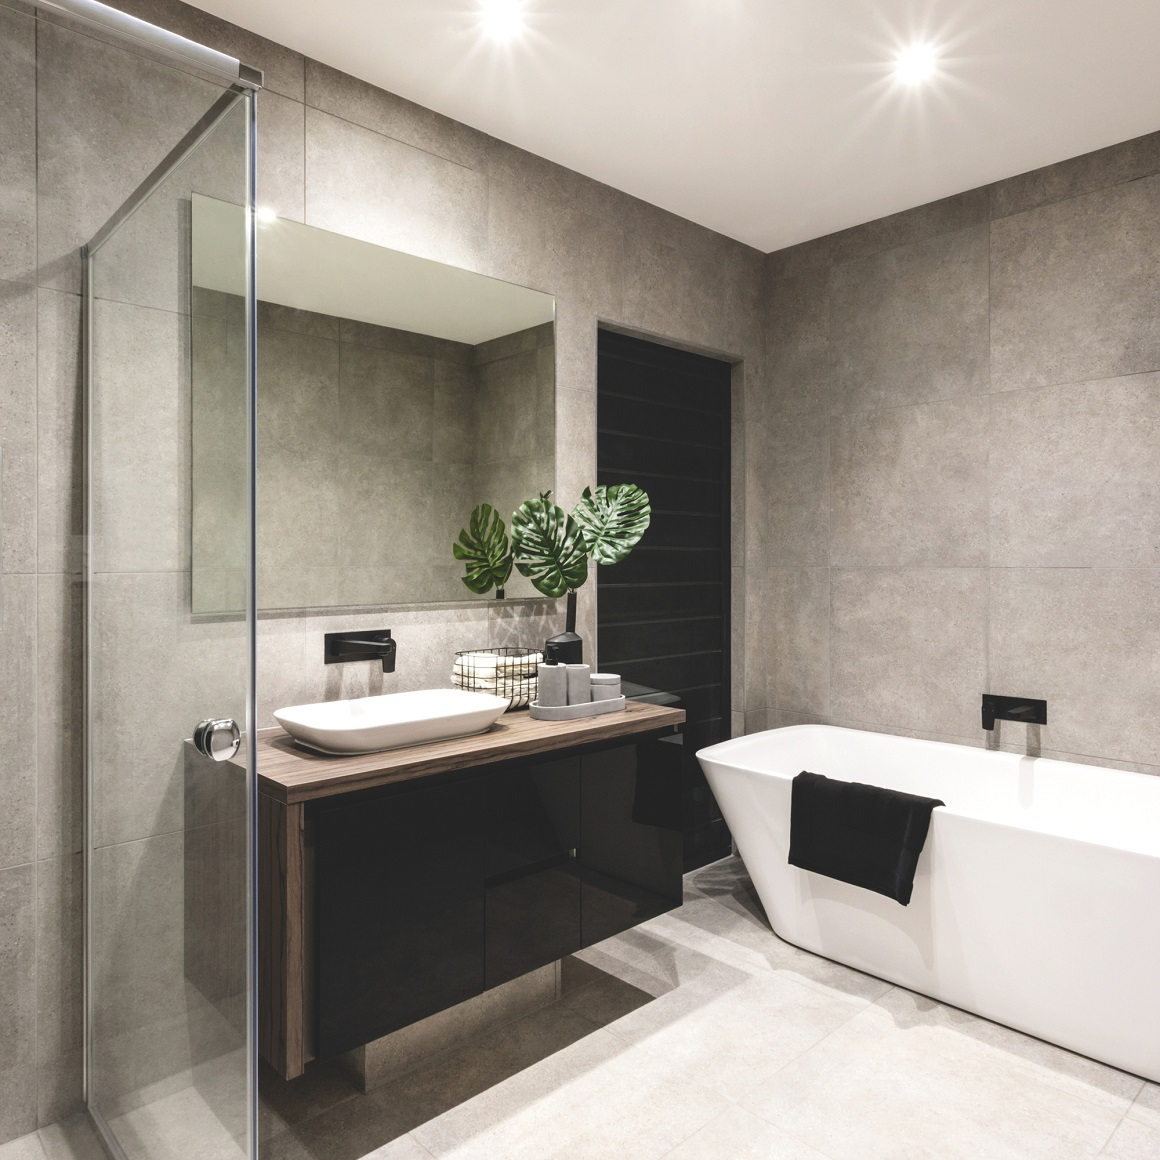 Infrarotheizung-Spiegel-VASNER-Zipris-S-SR-Rahmenlos-Infrarot-Badezimmer